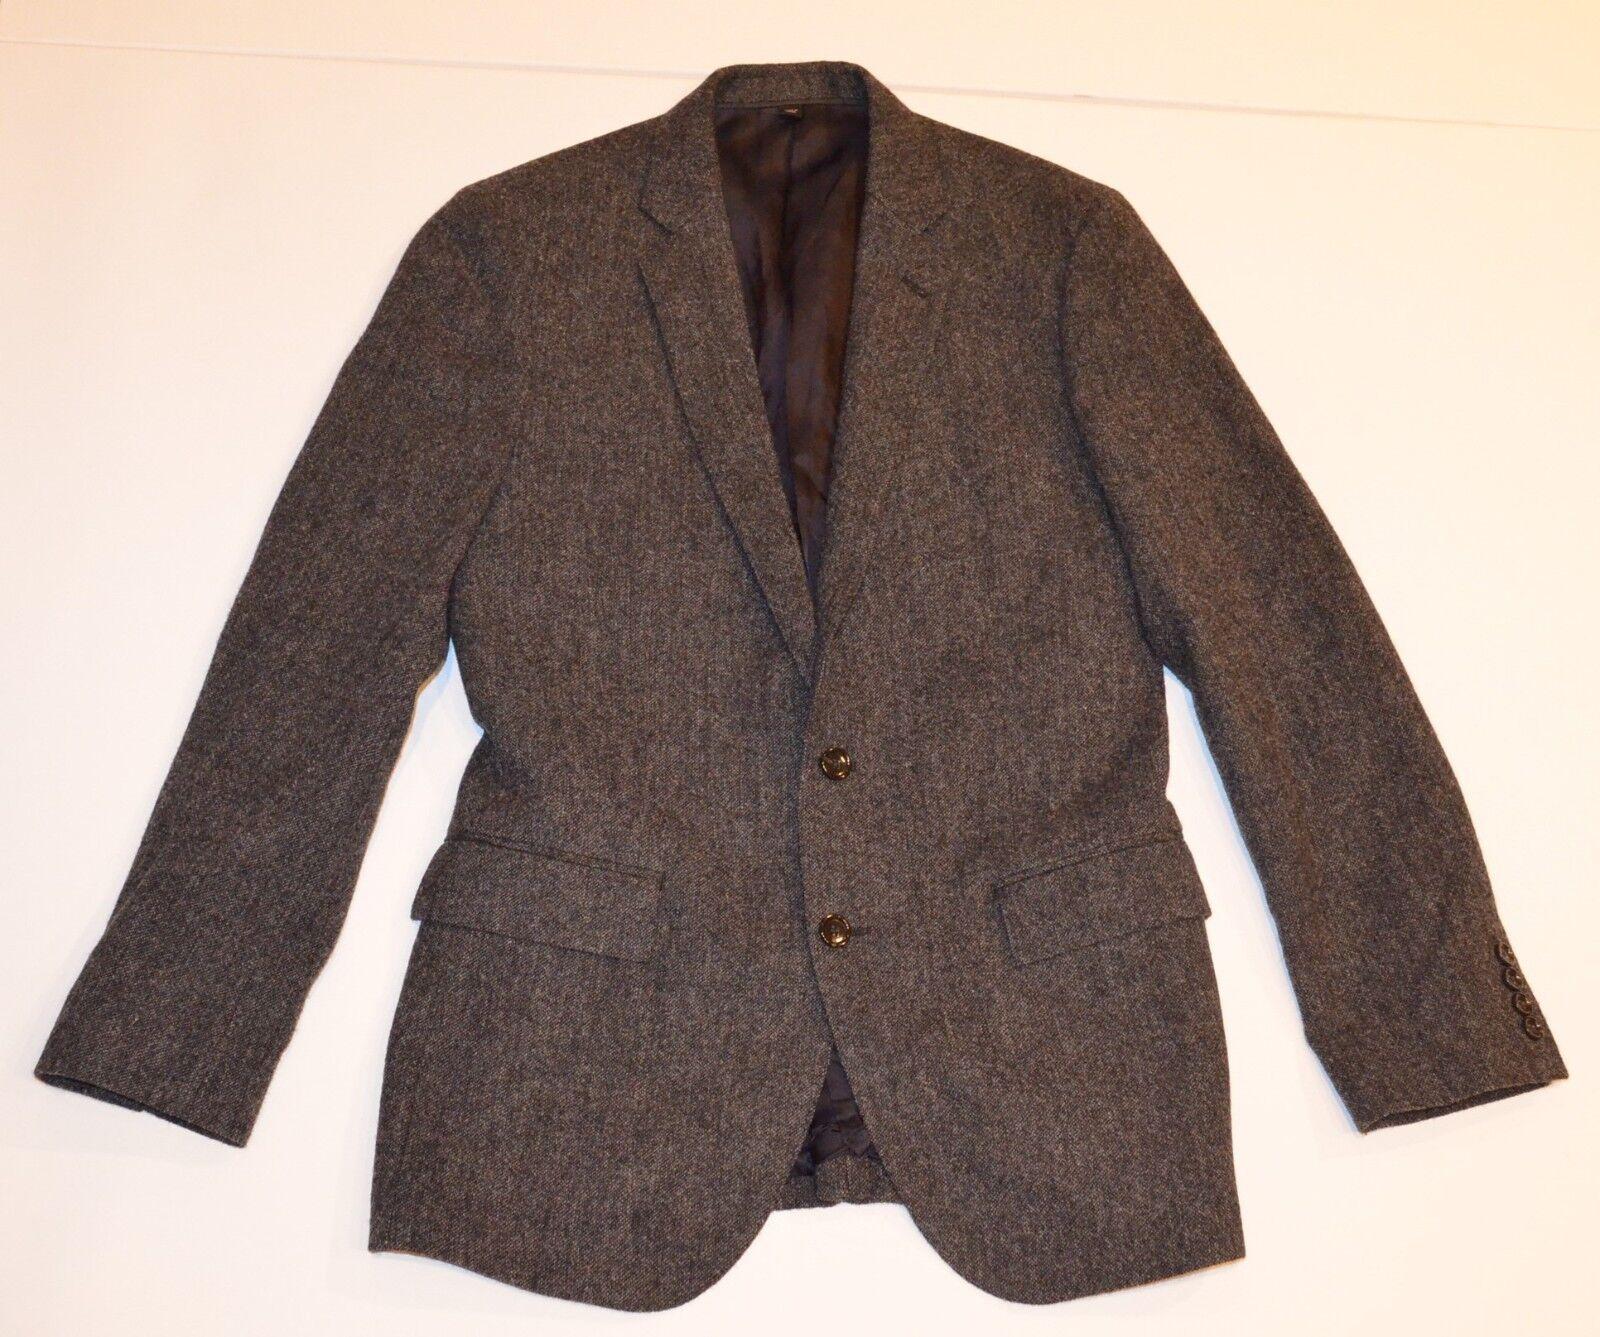 NWOT J.Crew Ludlow Wool Sport Coat Blazer Sz 36 36R Moon Jersey Fabric Slim grau